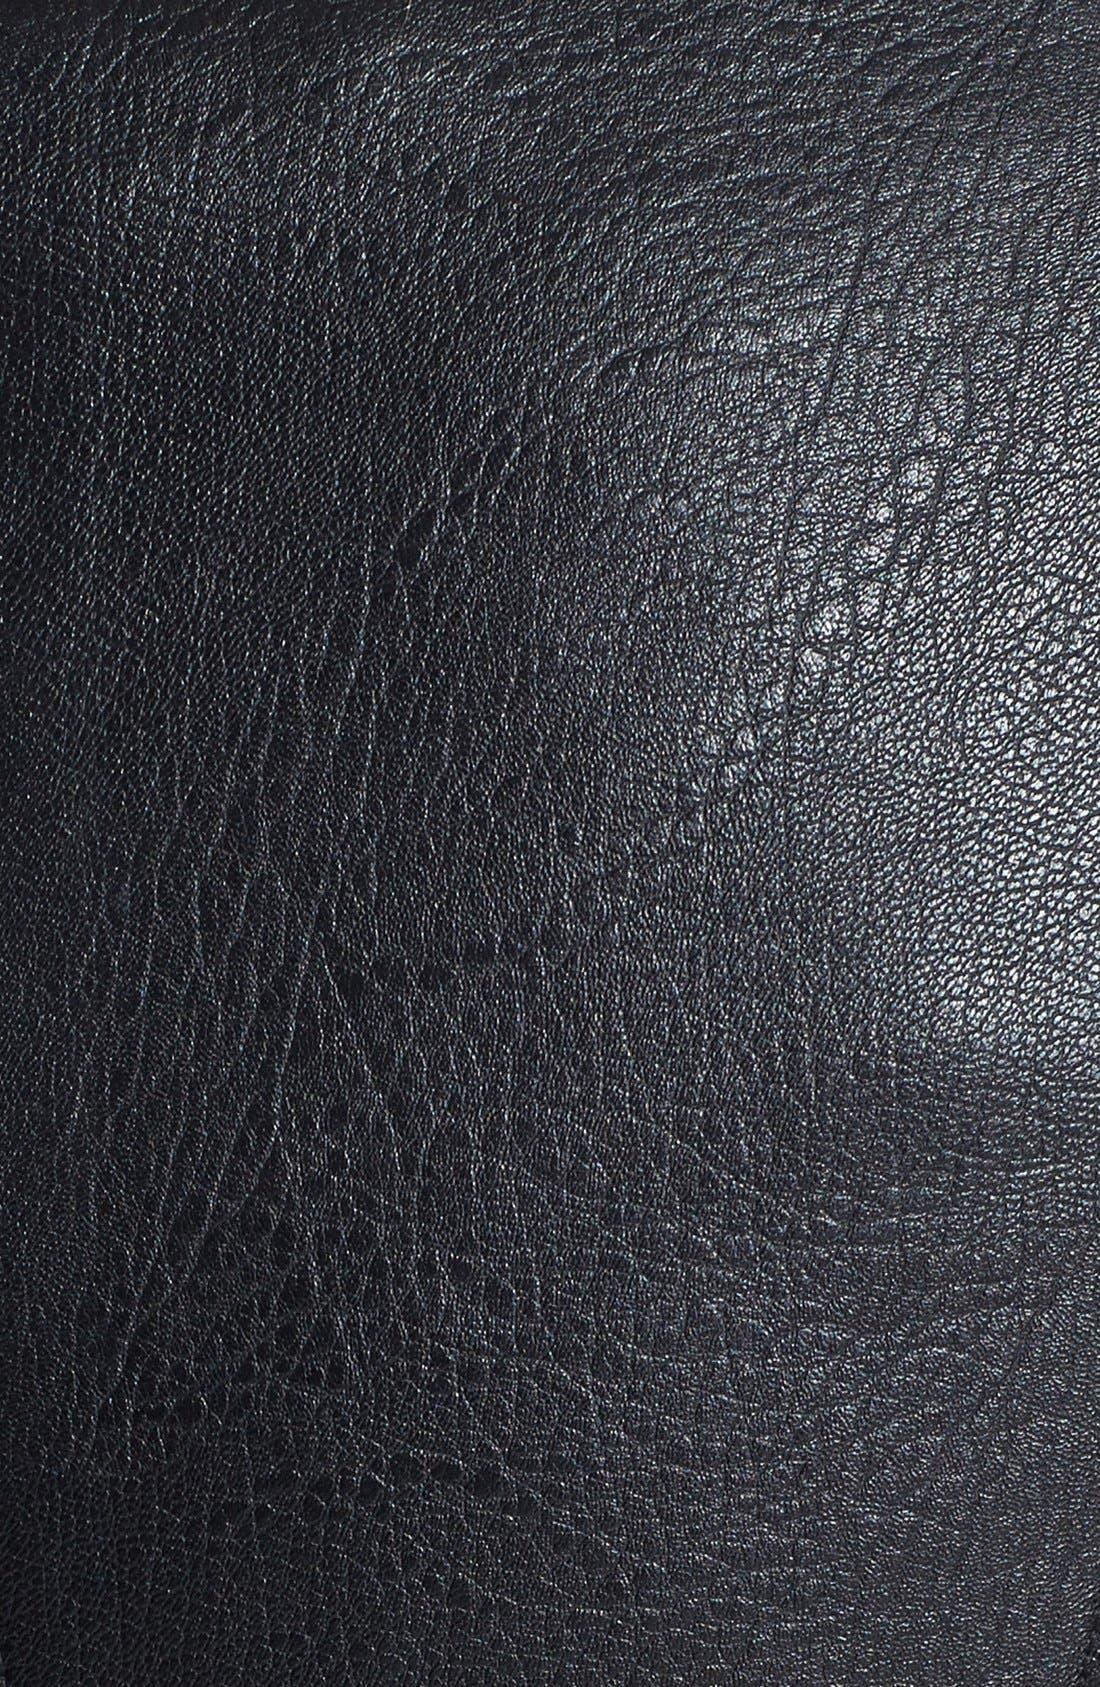 Alternate Image 3  - BCBGeneration Faux Leather & Faux Calf Hair Moto Jacket